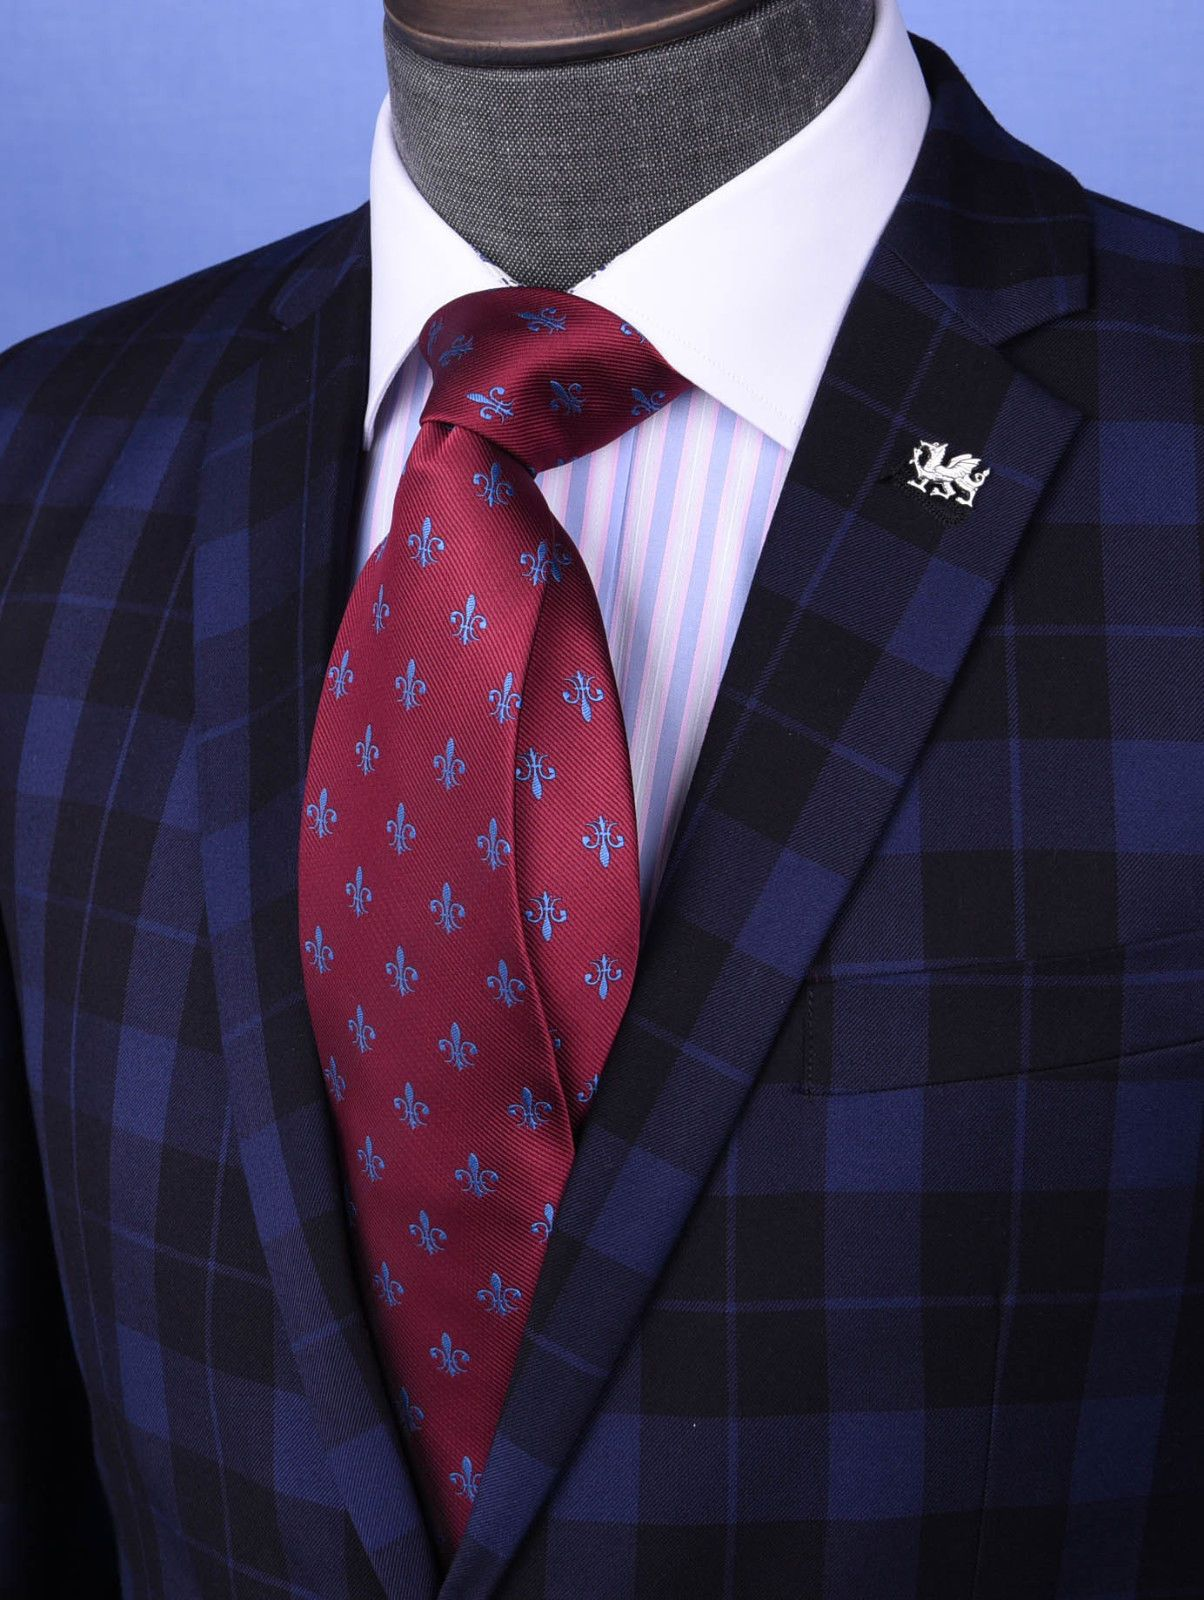 Silk Ties Mens Fleur-de-lis Necktie | Etsy in 2020 | Ties